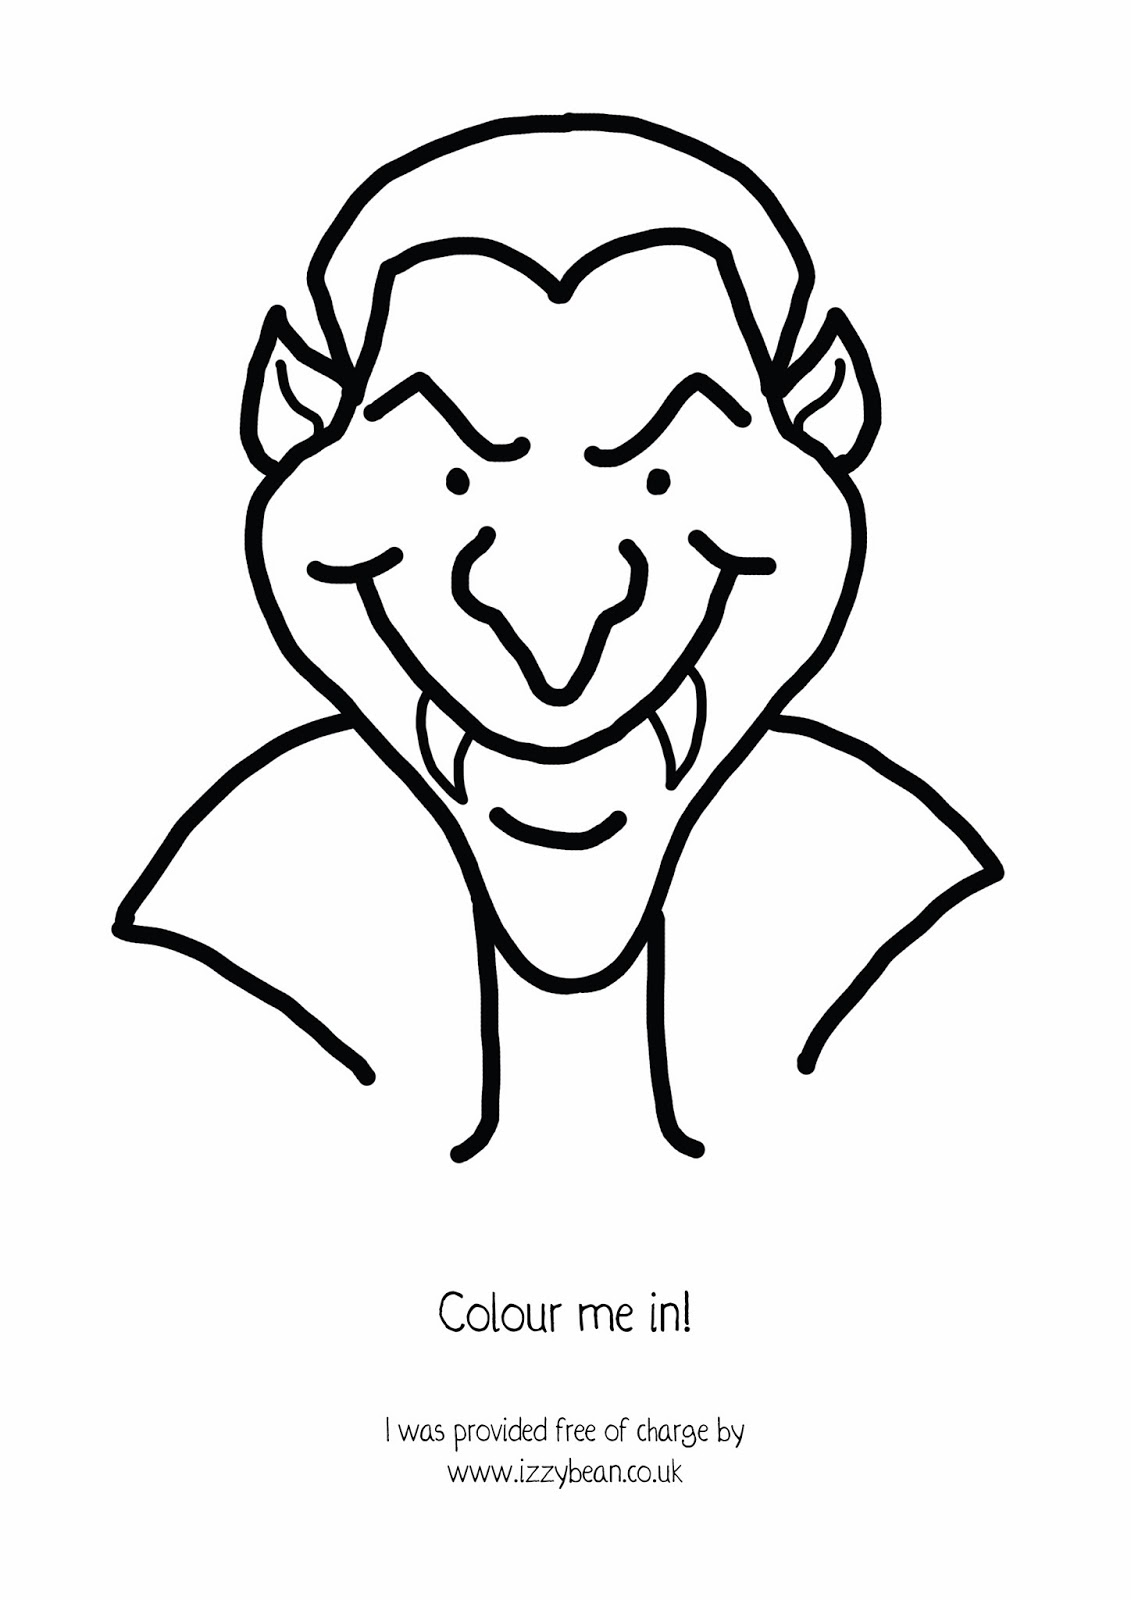 Halloween Ausmalbilder Vampir : Dracula Drawing At Getdrawings Com Free For Personal Use Dracula